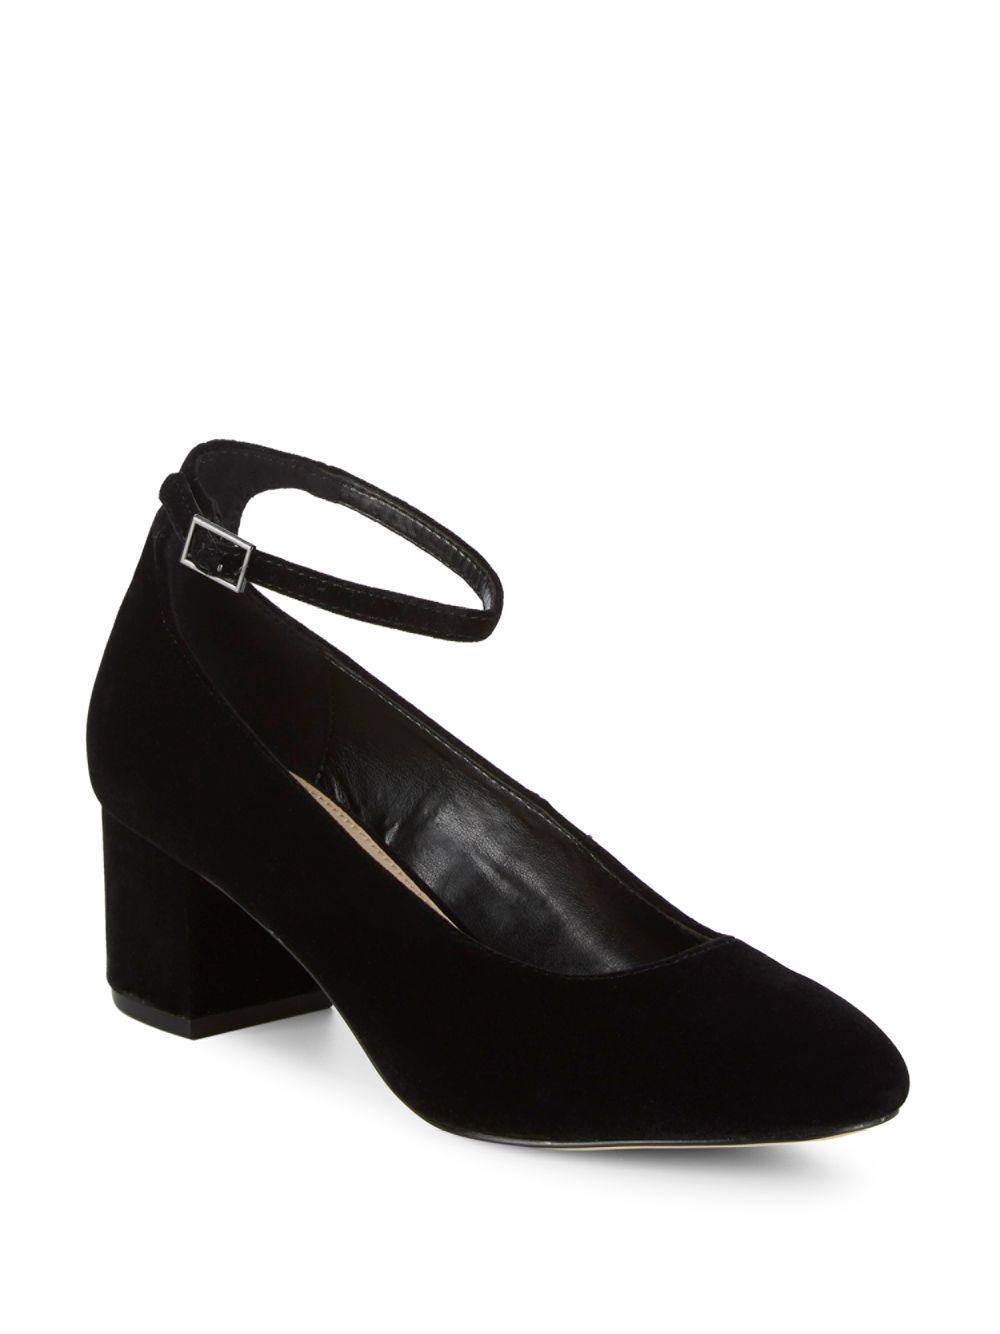 5c0b861ffa4 Women's Black Amelia Almond Toe Pumps